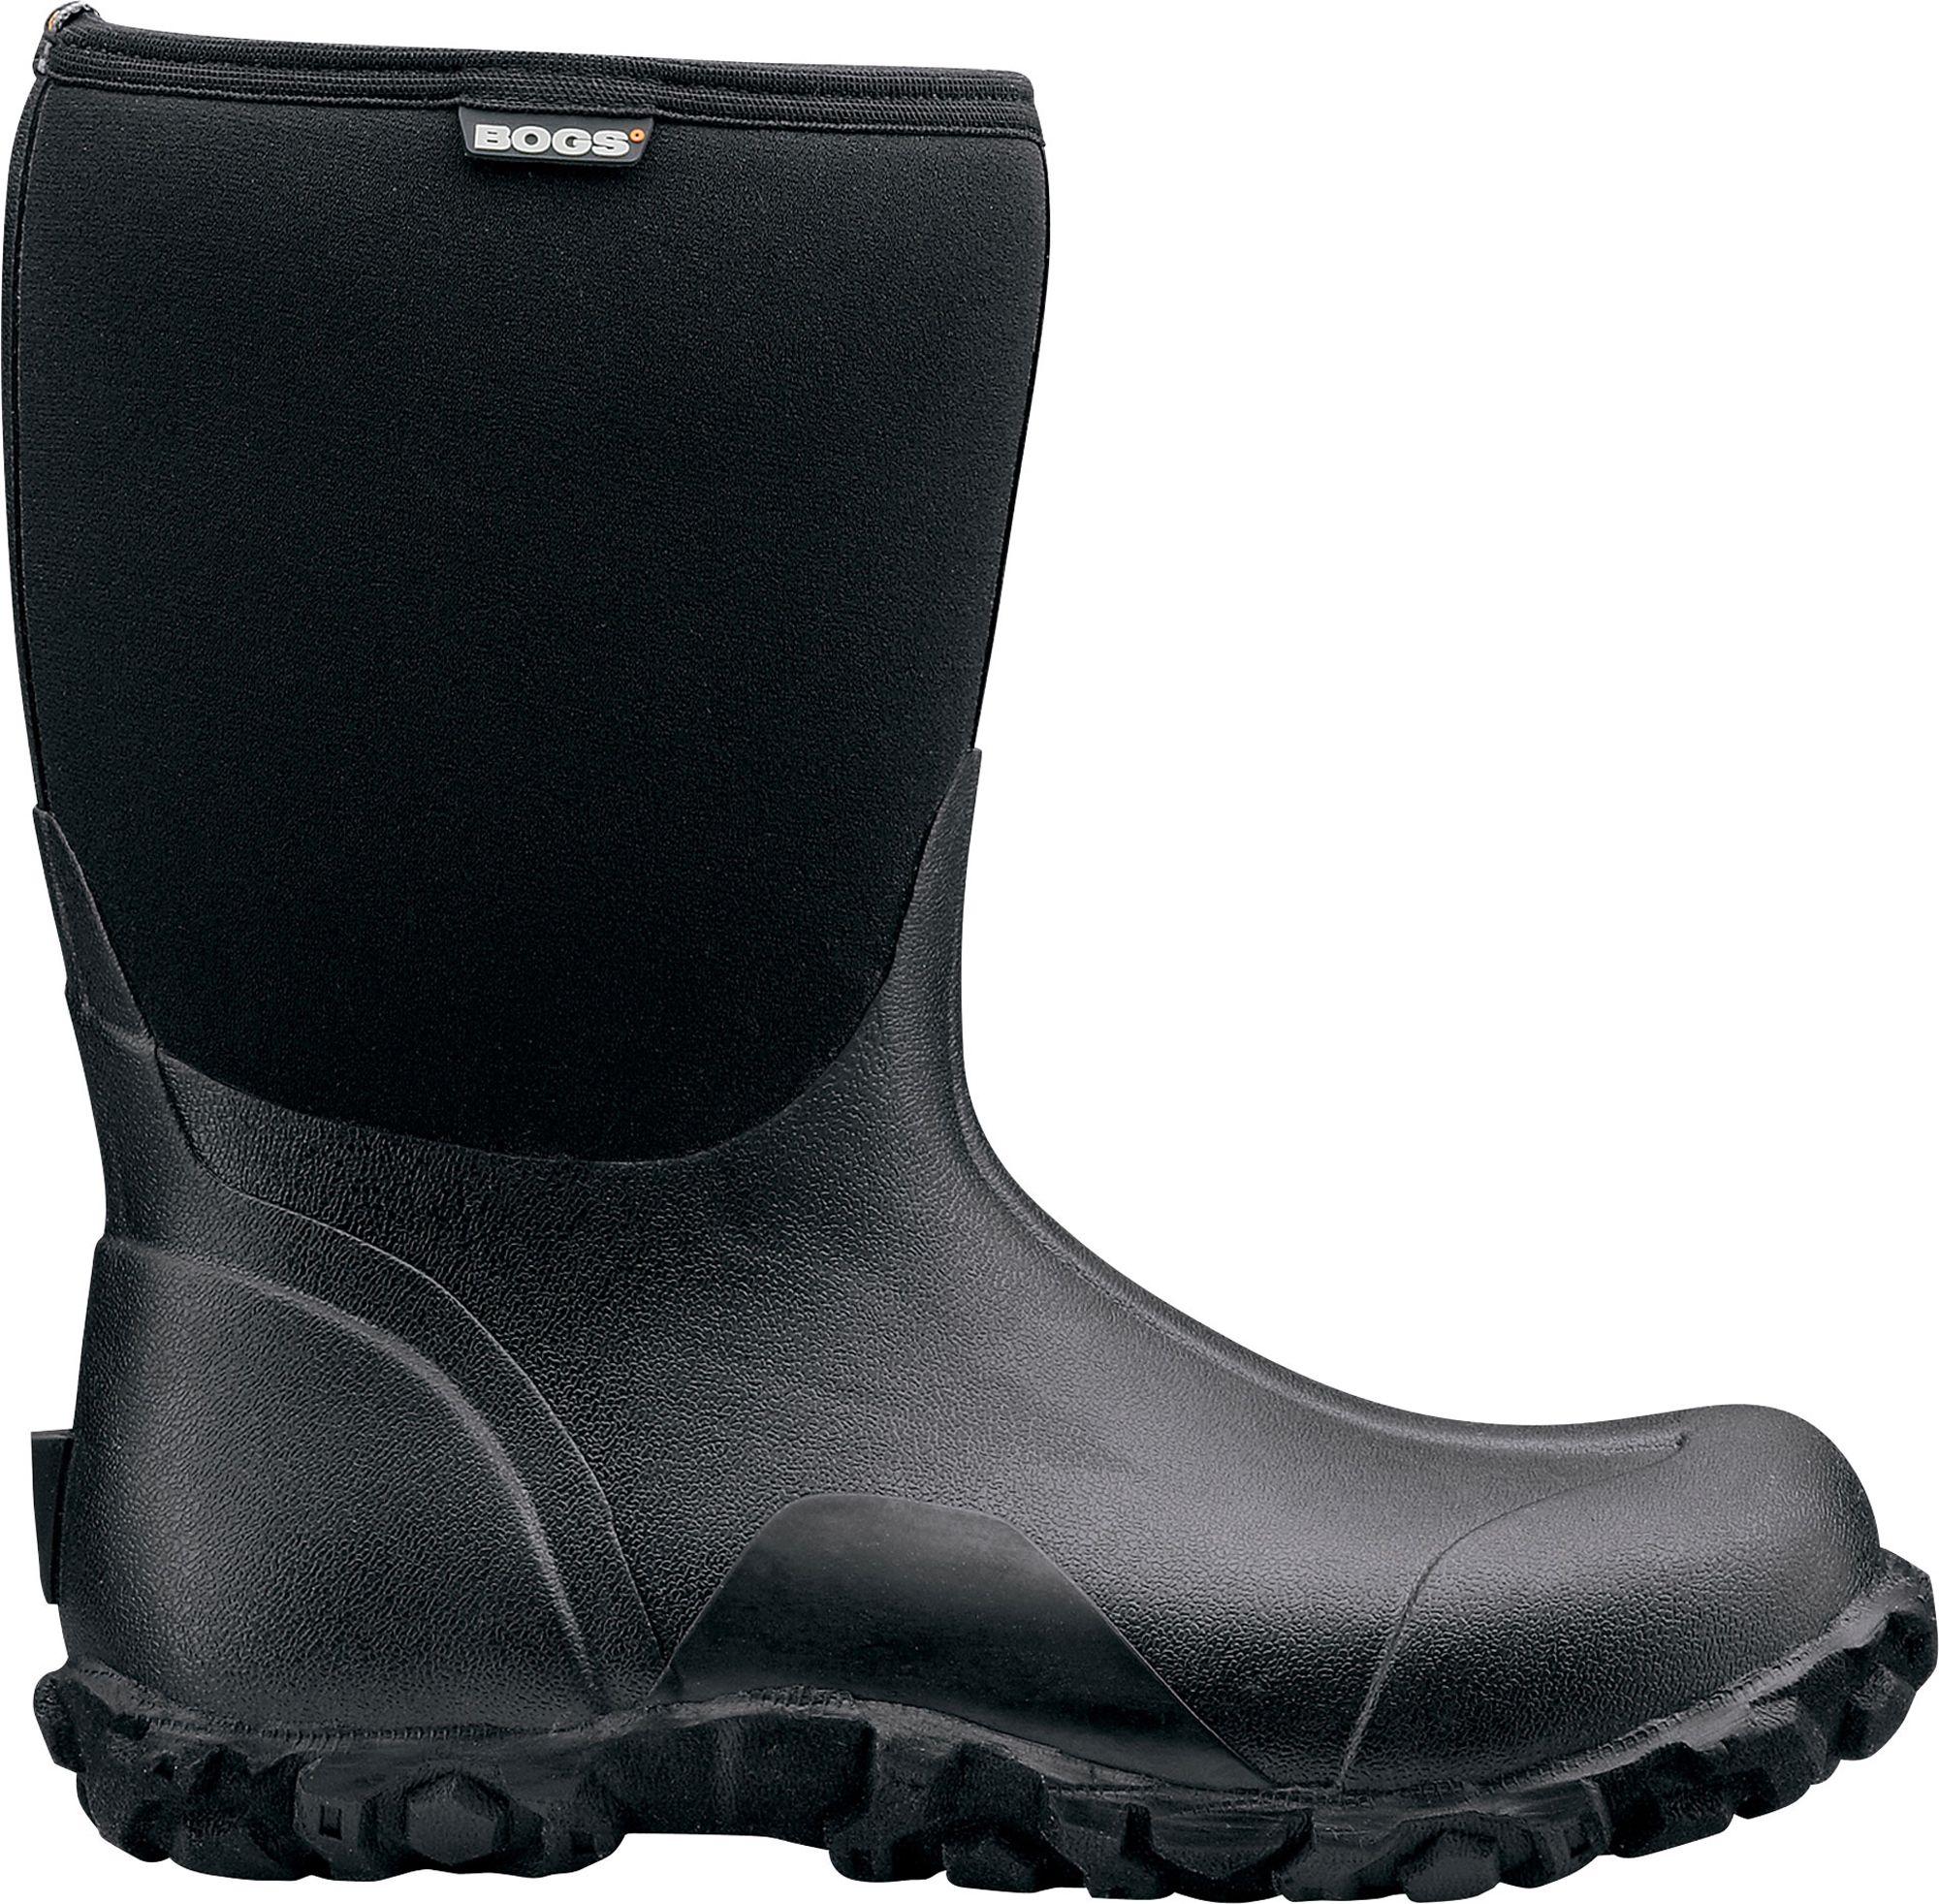 bogs boots for men women u0026 kids u0027s sporting goods